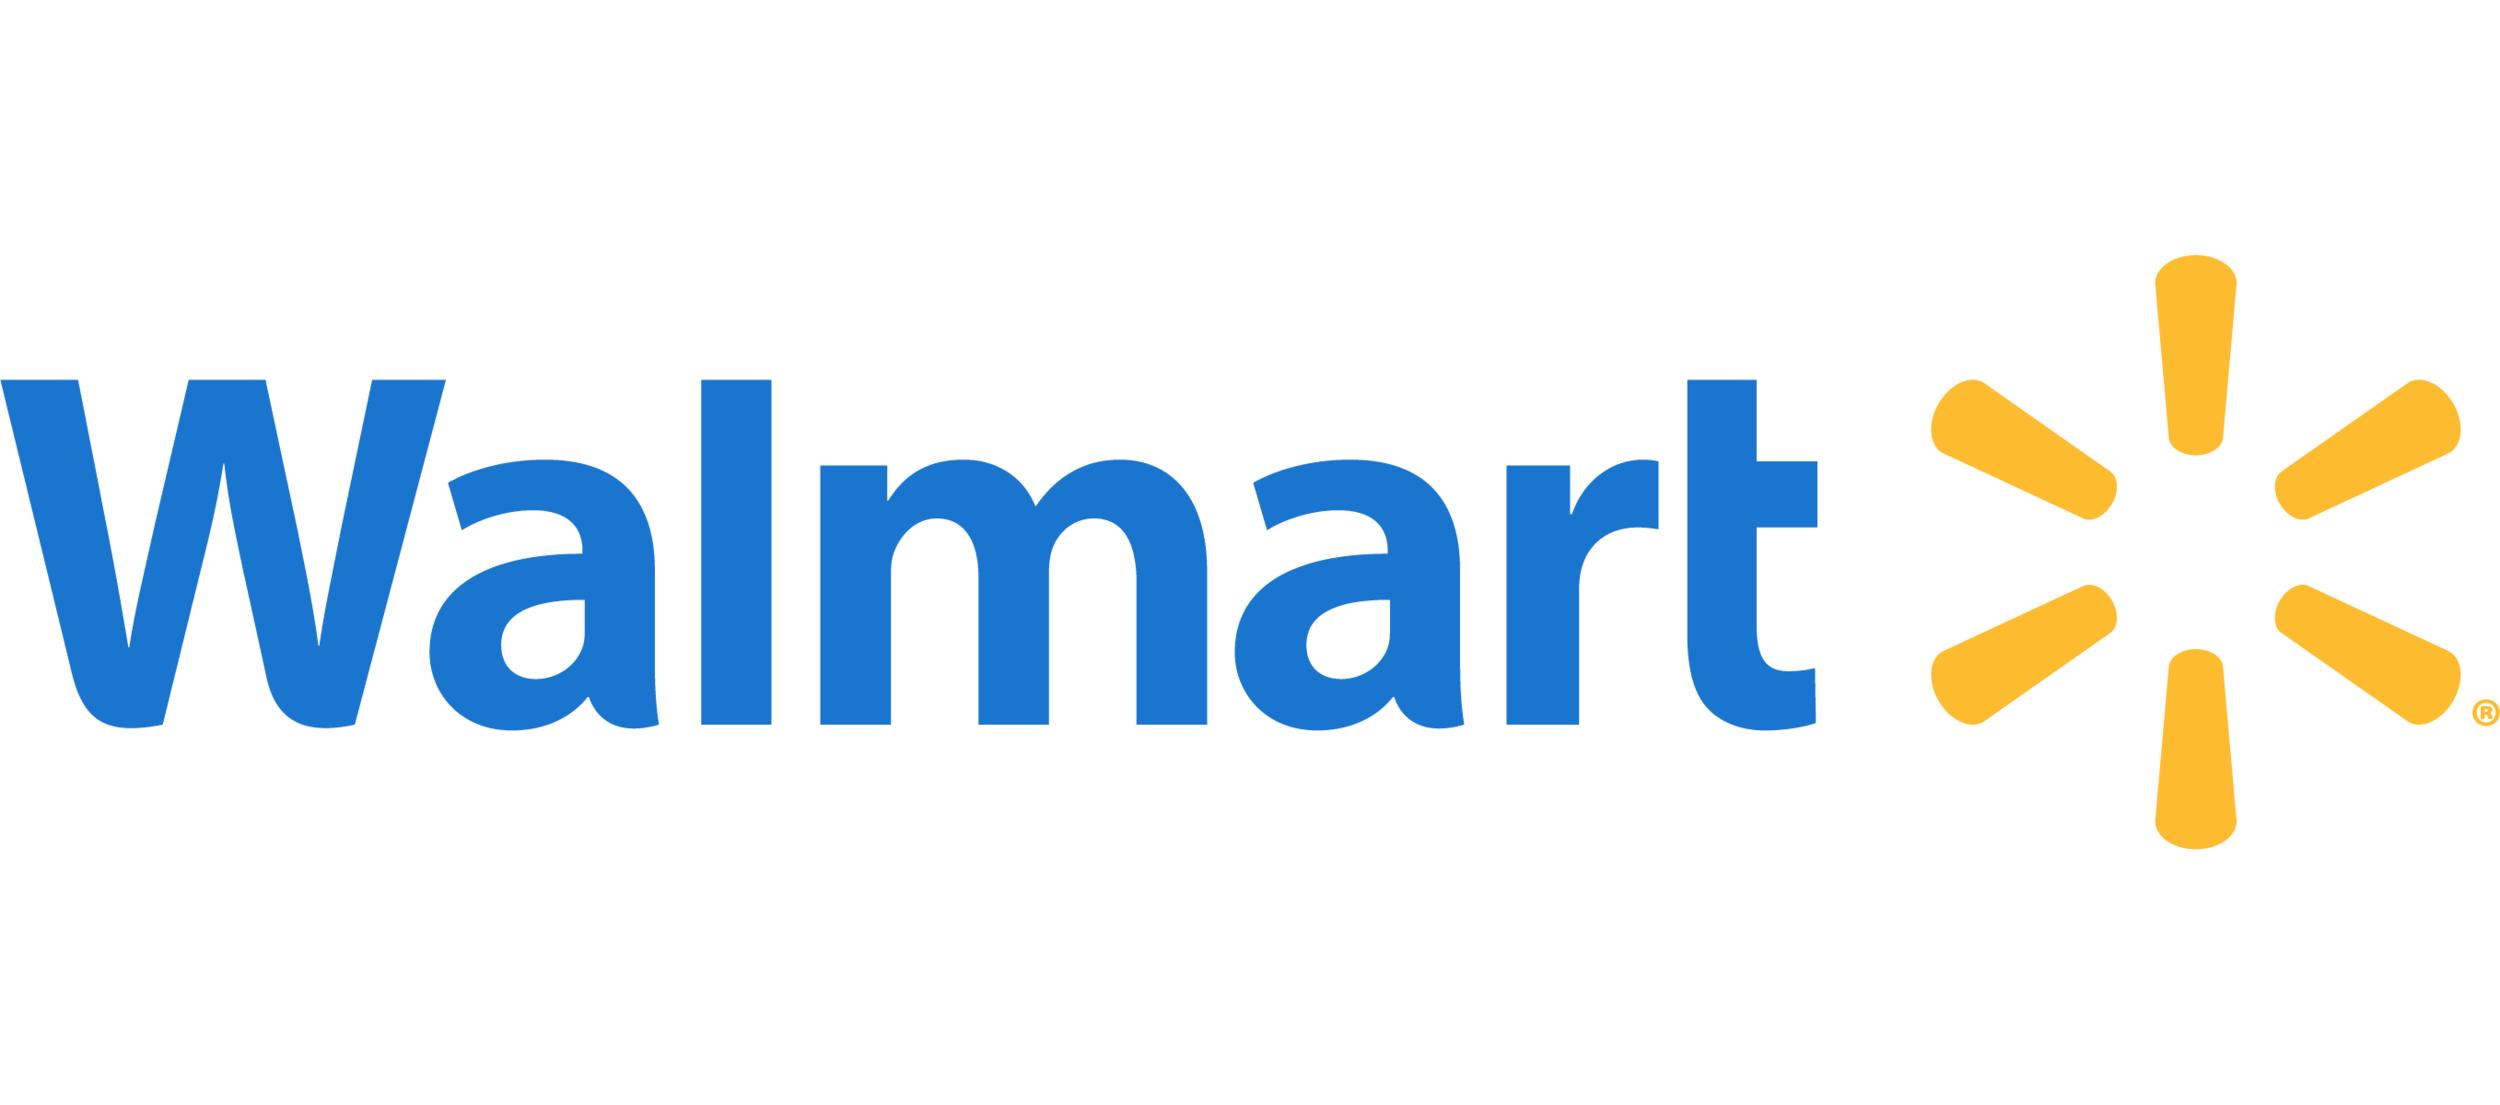 Wal-Mart-Stores-Inc.png